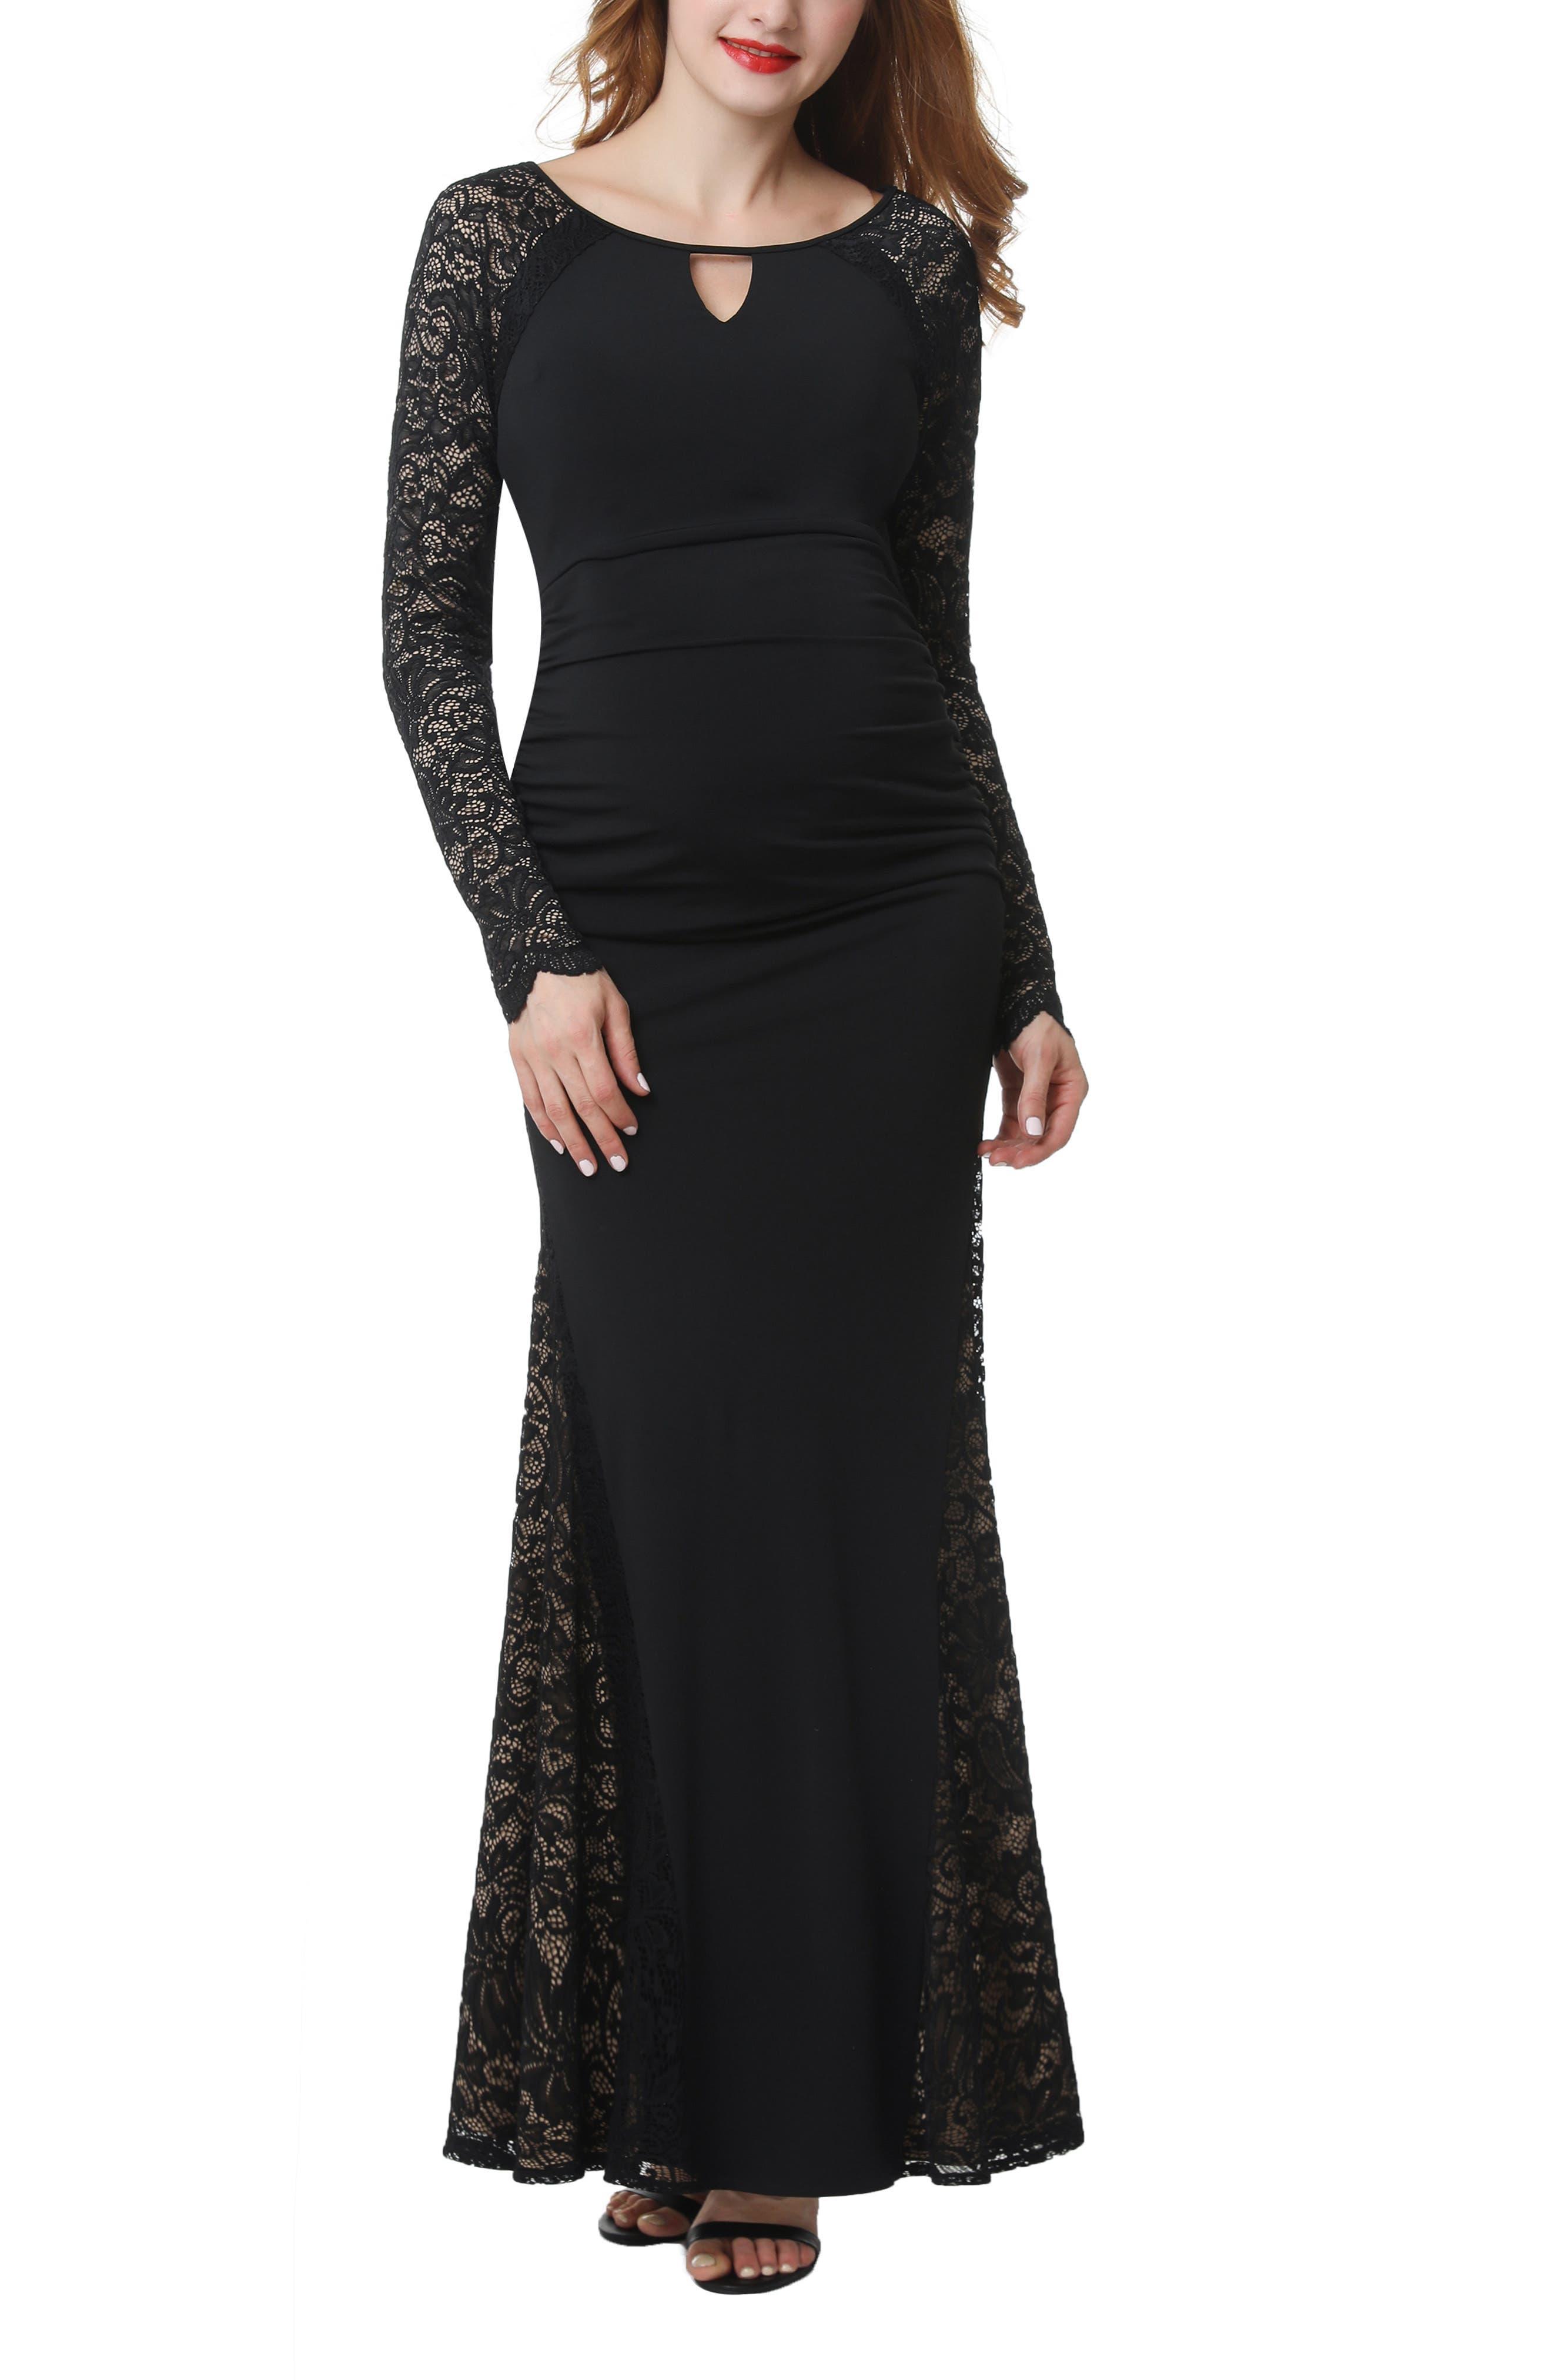 Bella Maternity Maxi Dress,                             Main thumbnail 1, color,                             BLACK